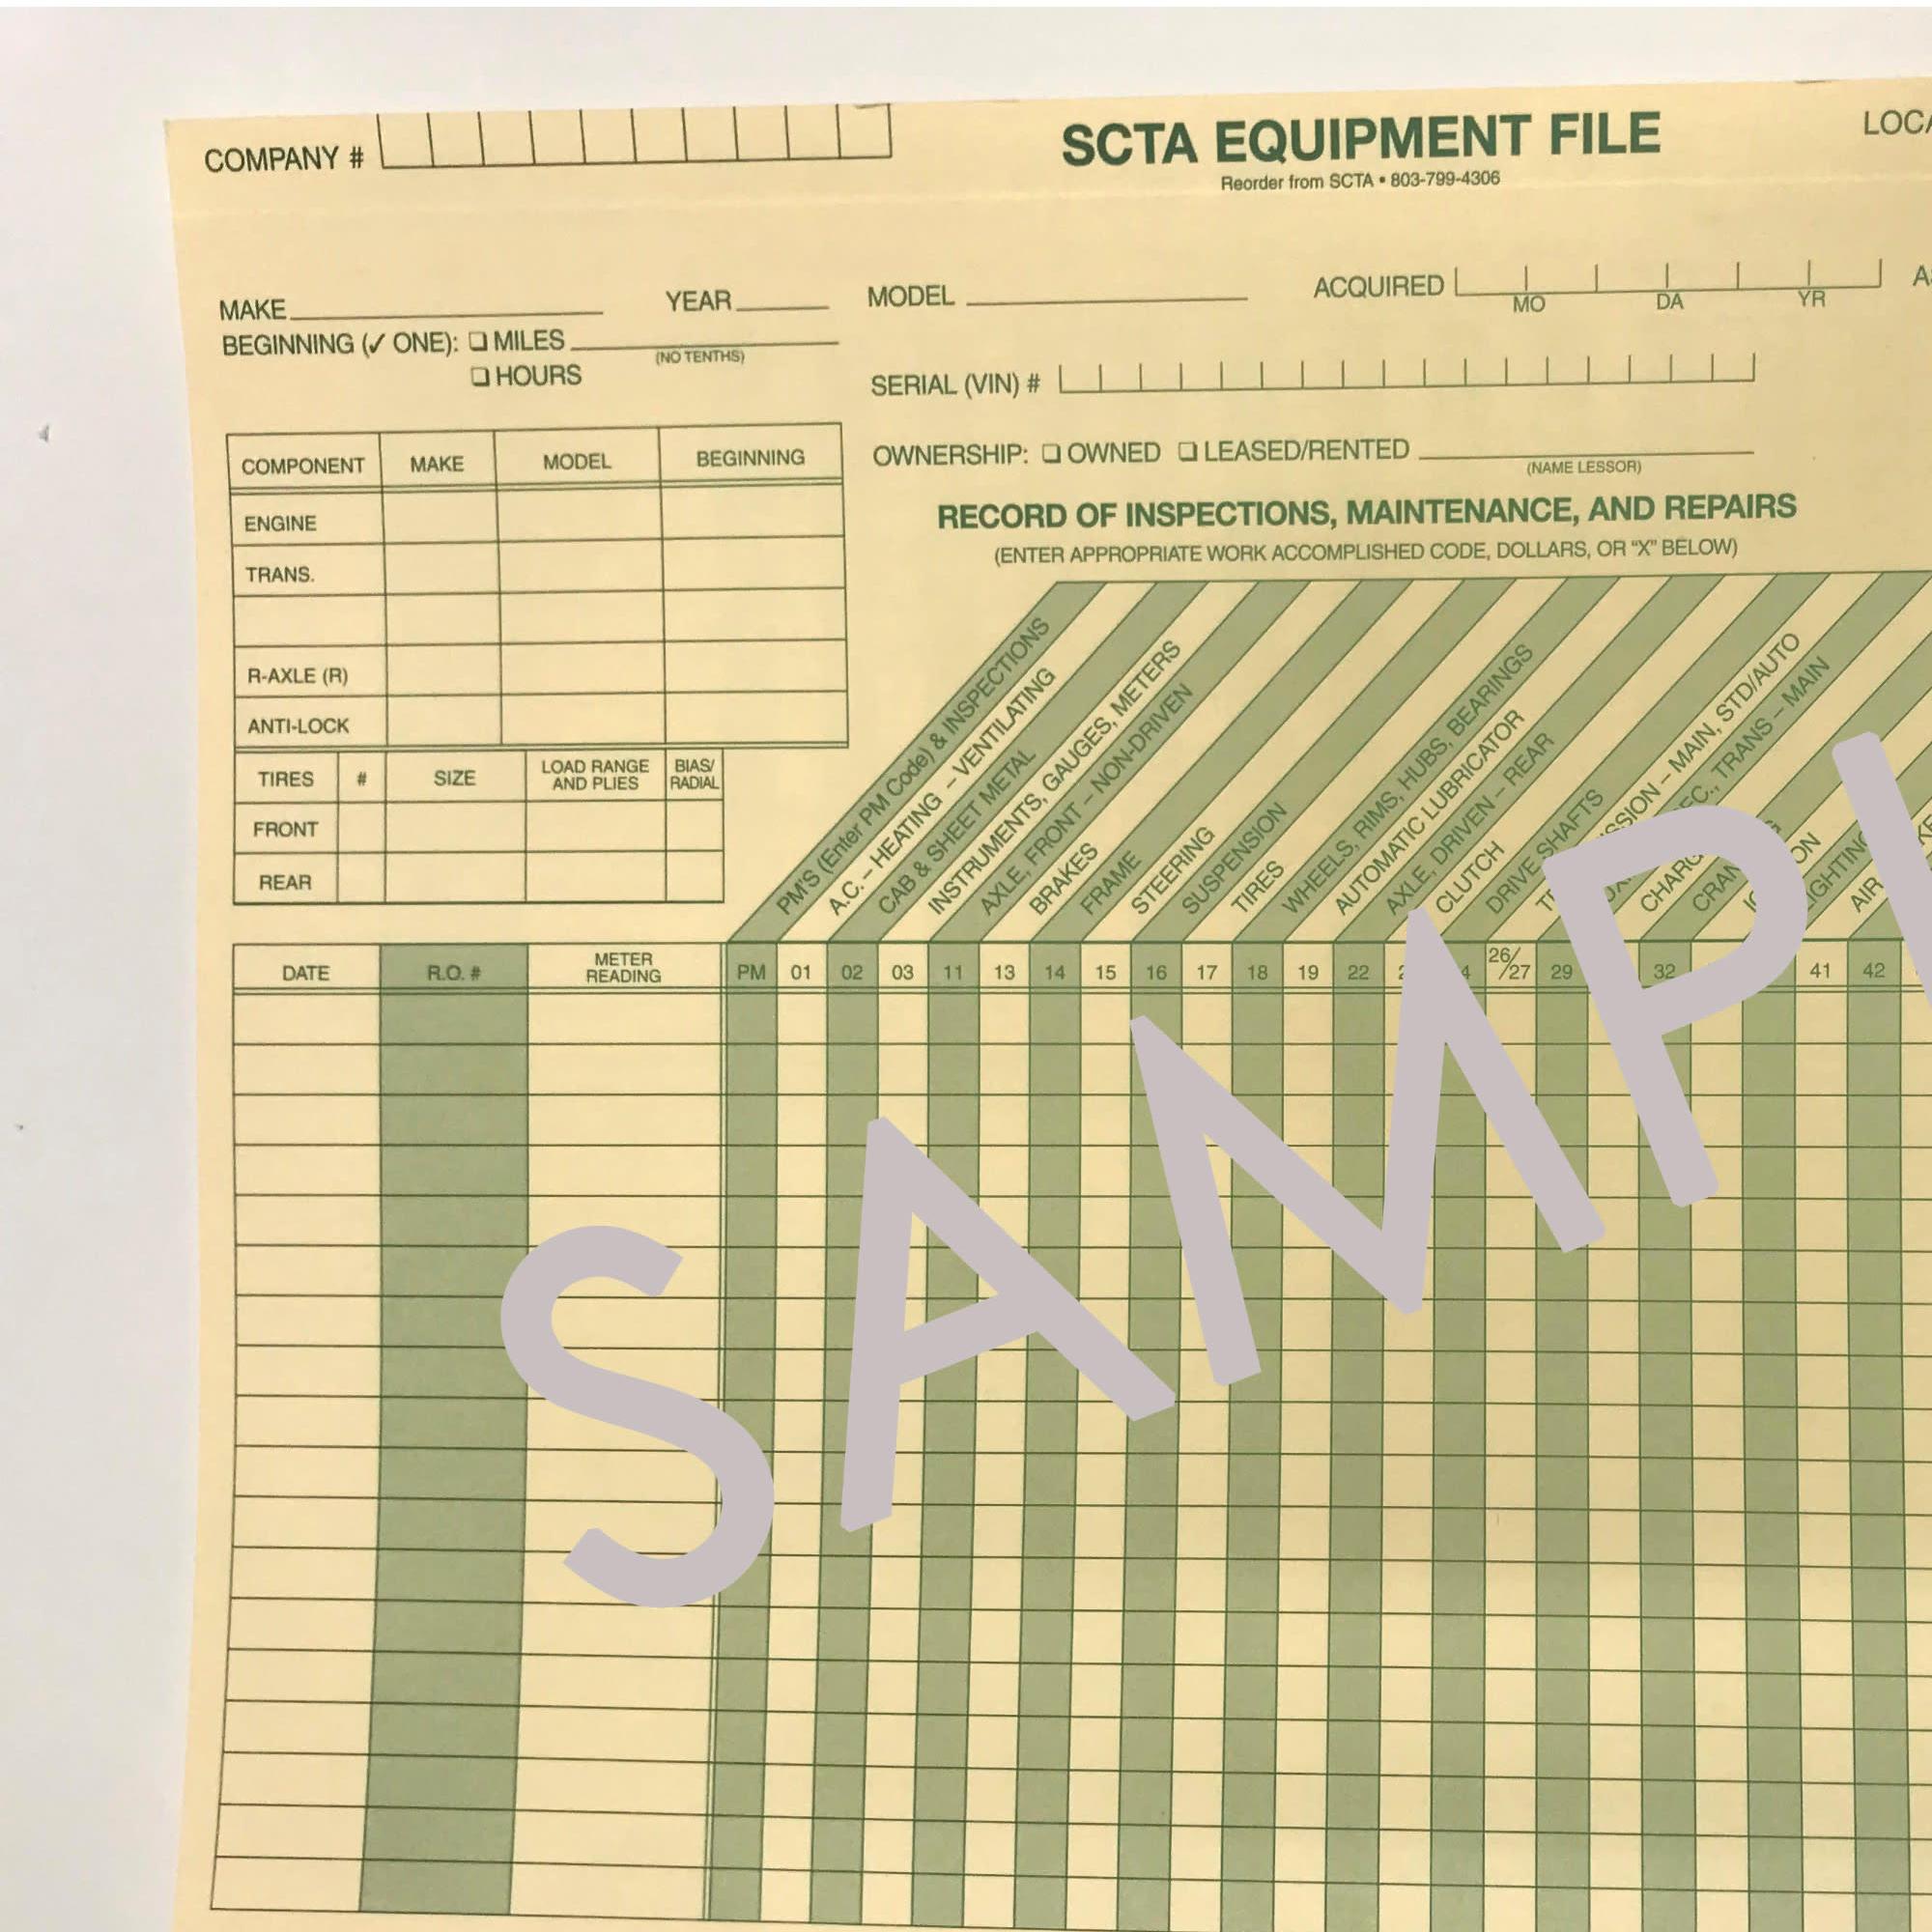 Equipment File